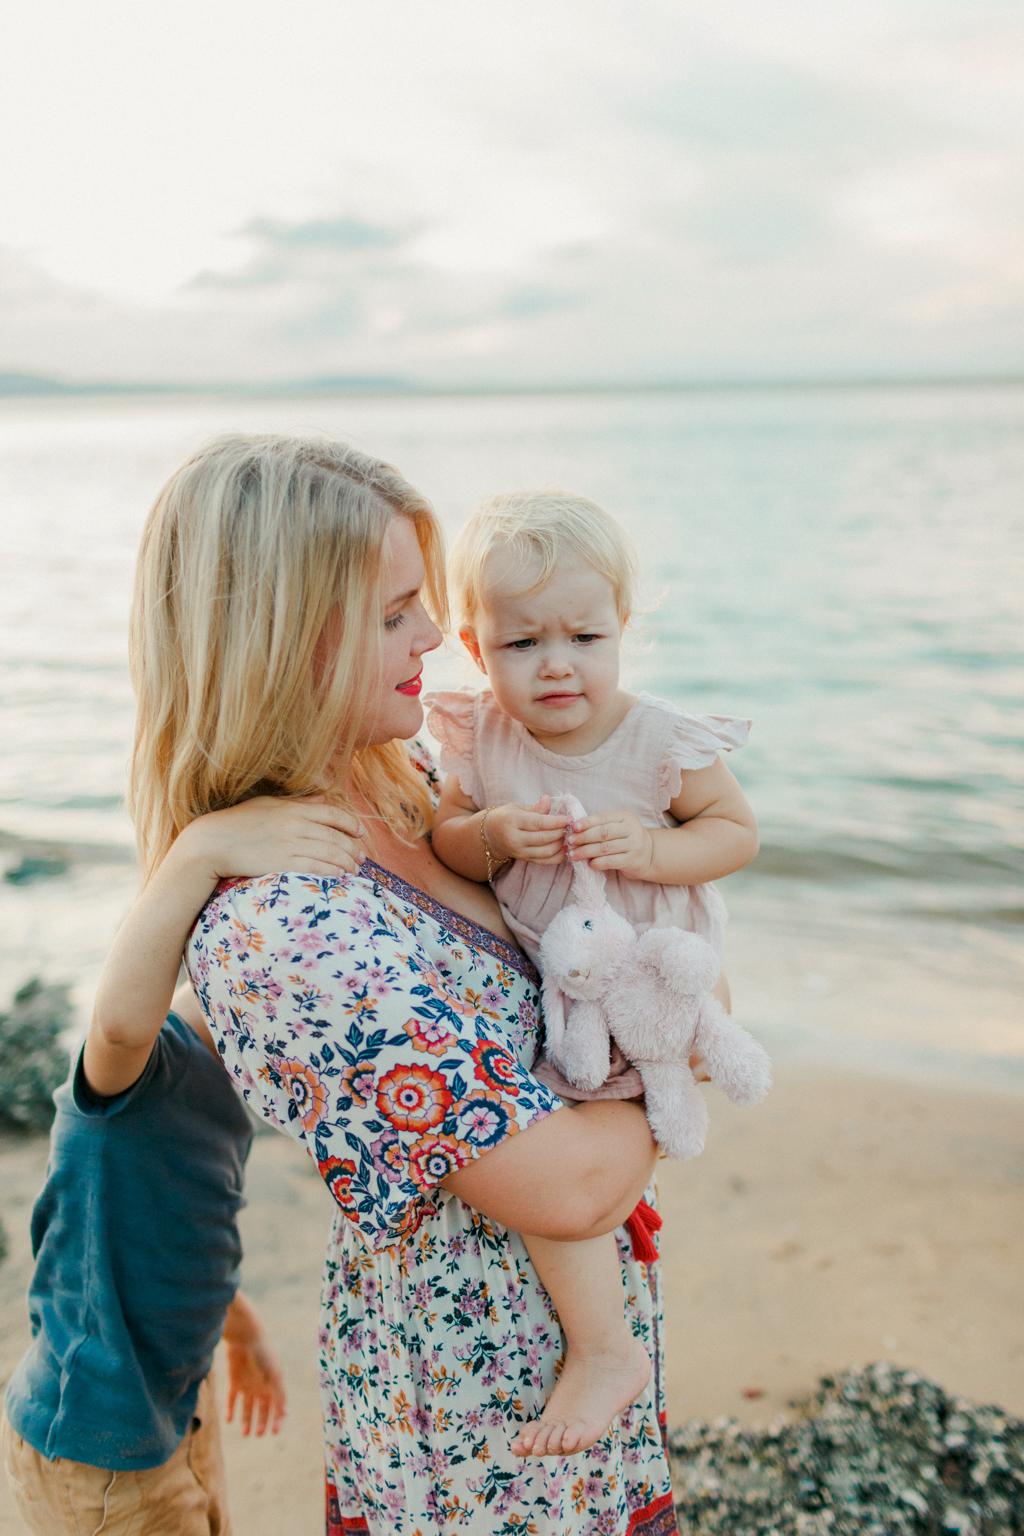 sunshin coast family photography-68.JPG